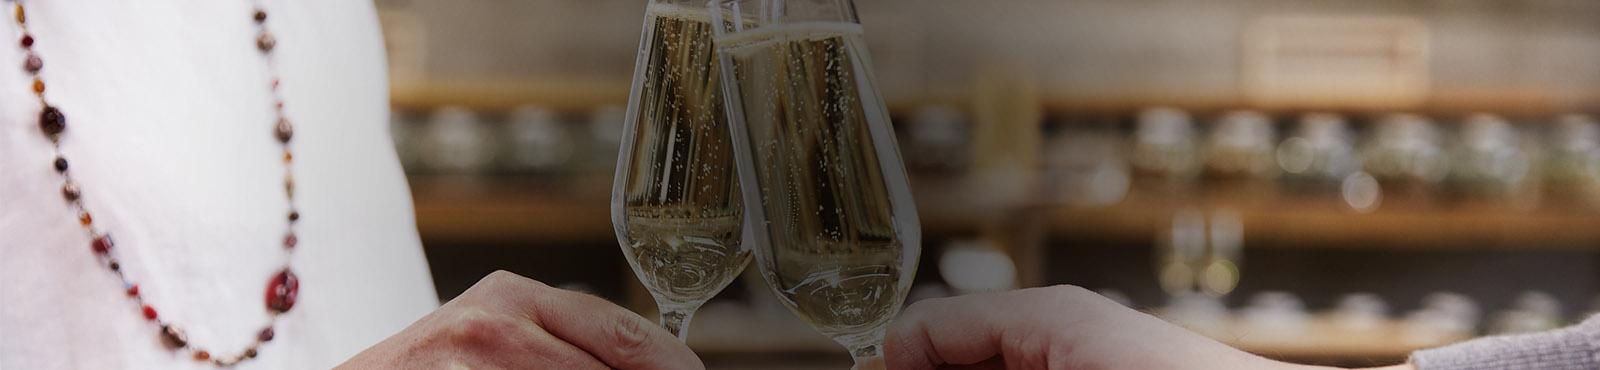 Flute à champagne Arcoroc